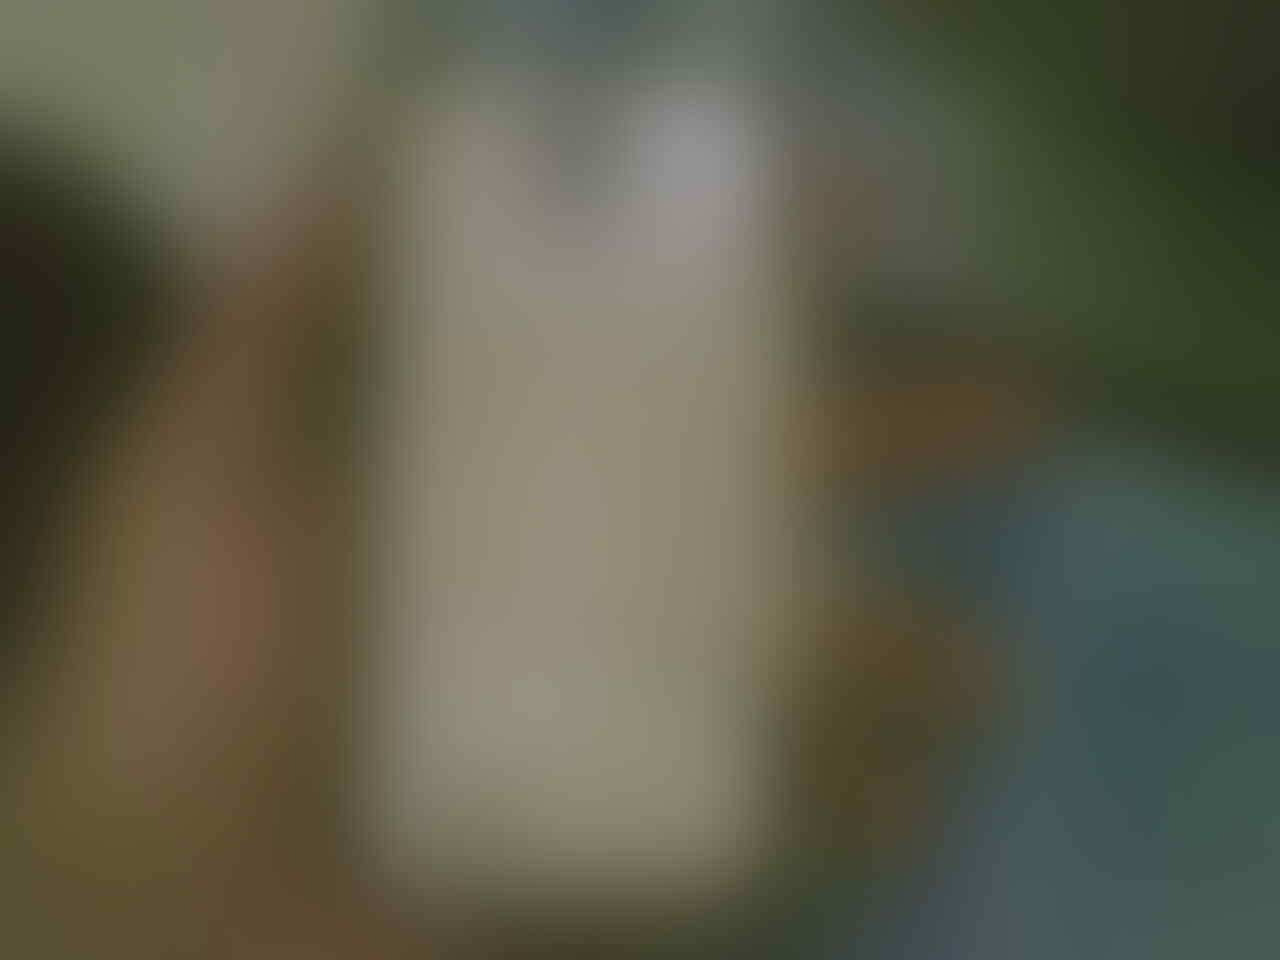 Di jual samsung Galaxy s4 full set mulus dan di jamin Ori Wilayah Malang